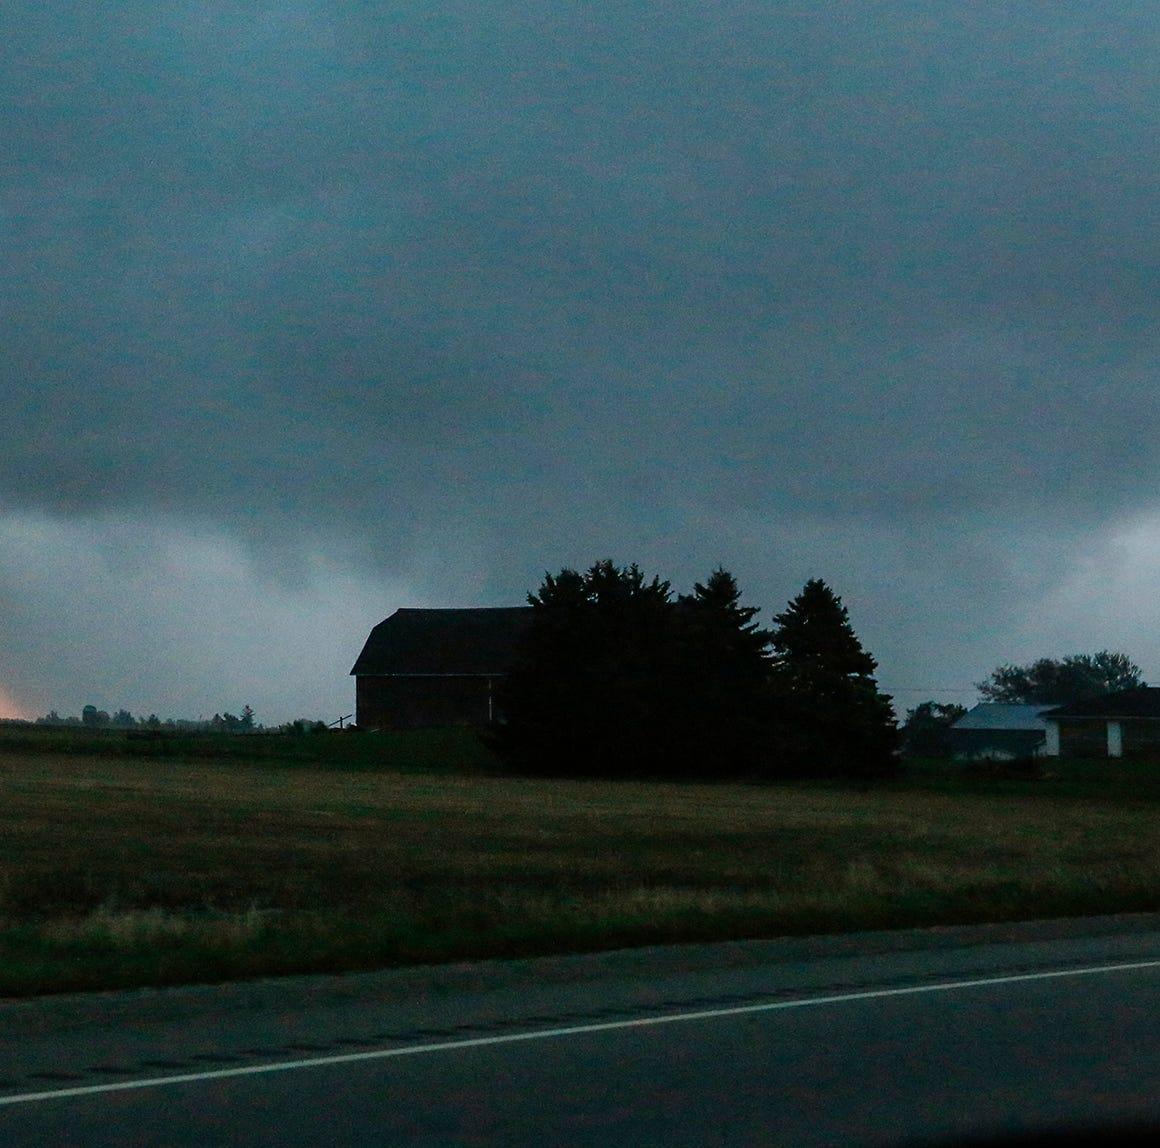 Tornado count reaches 19 in last week's storms across Wisconsin